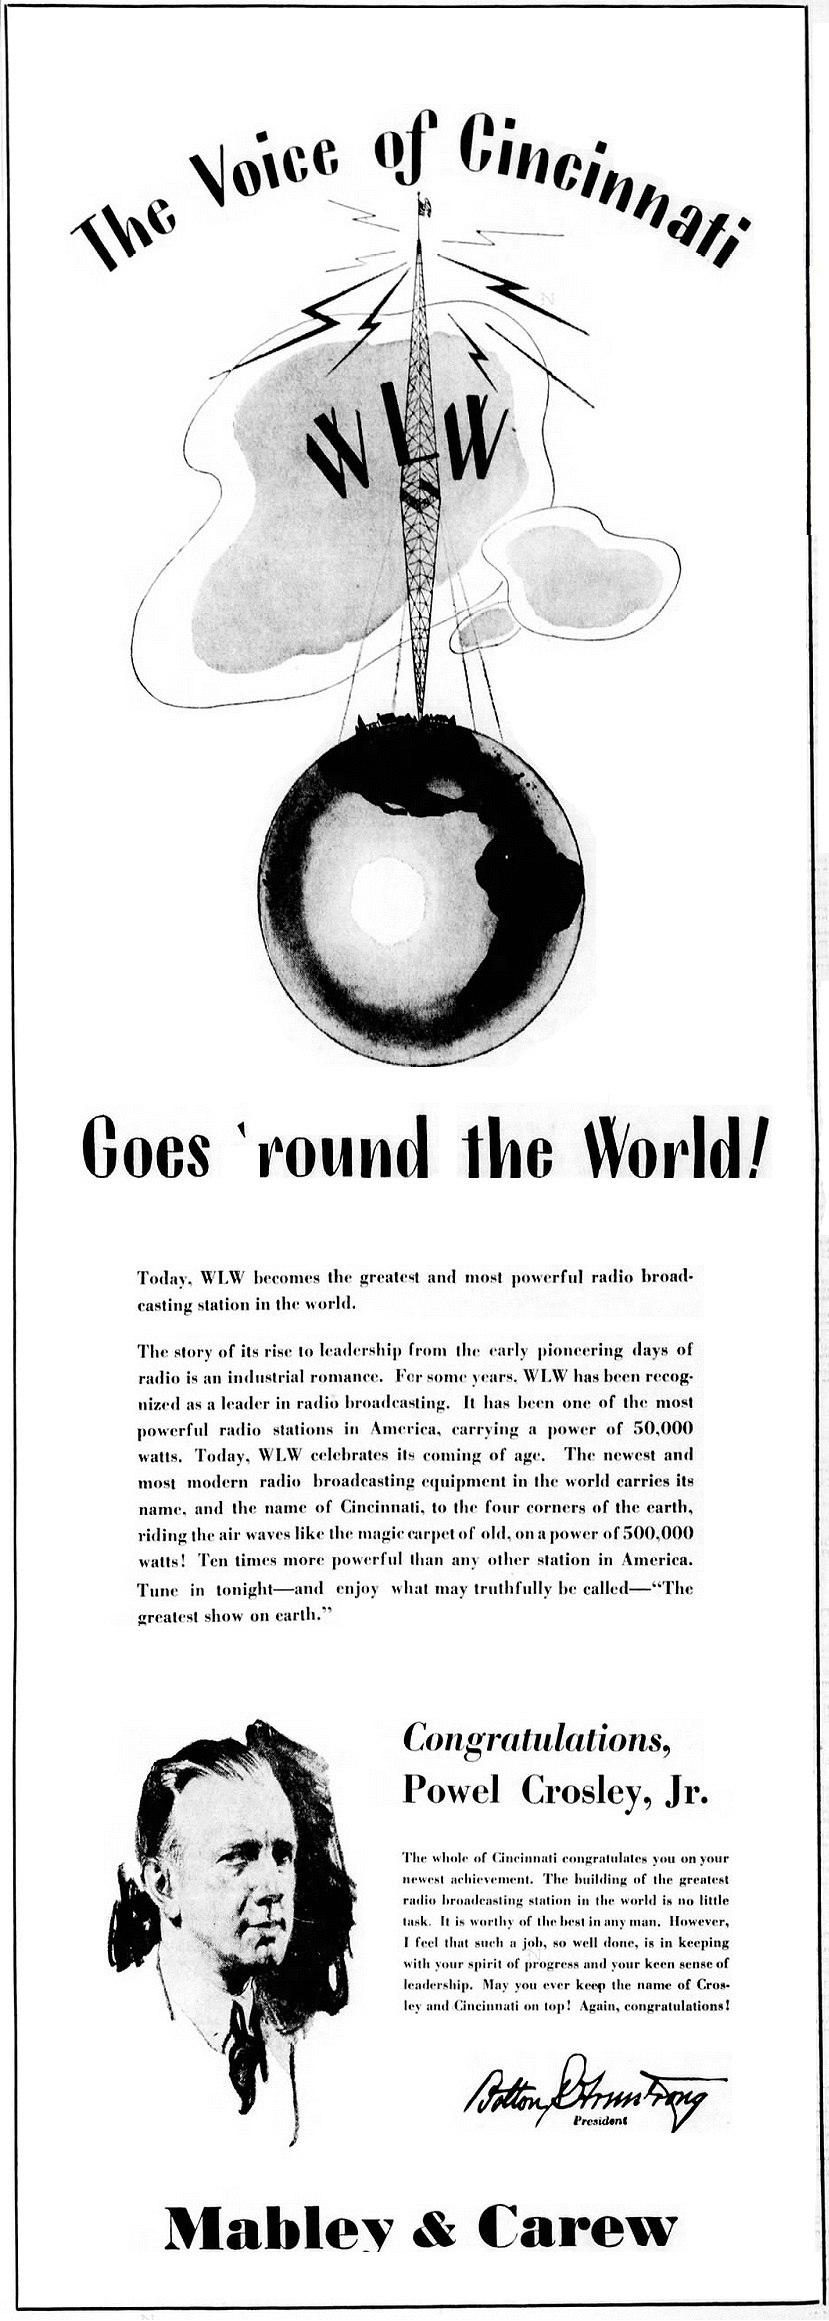 Mabley and Carew advertisement congratulating WLW Cincinnati Ohio radio (1934)